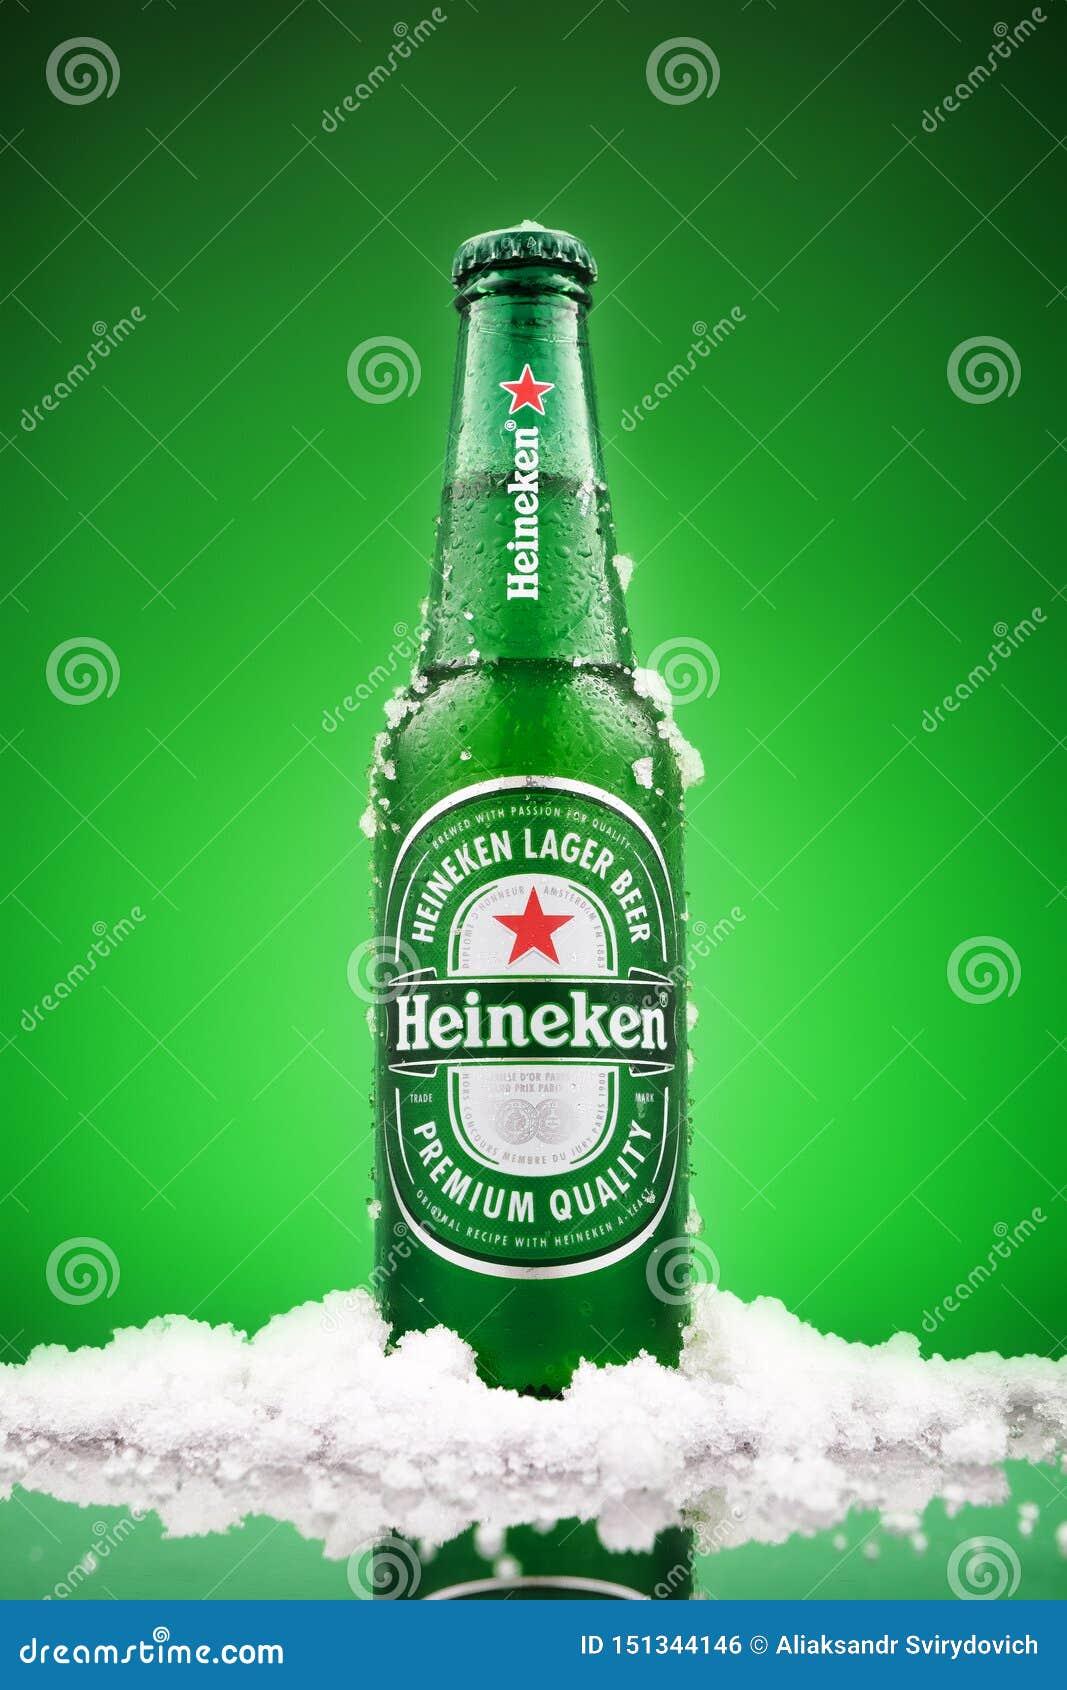 МИНСК, БЕЛАРУСЬ - 13-ОЕ МАРТА 2019: Холодная бутылка пива лагера Heineken над зеленой предпосылкой Heineken корабль- флагман